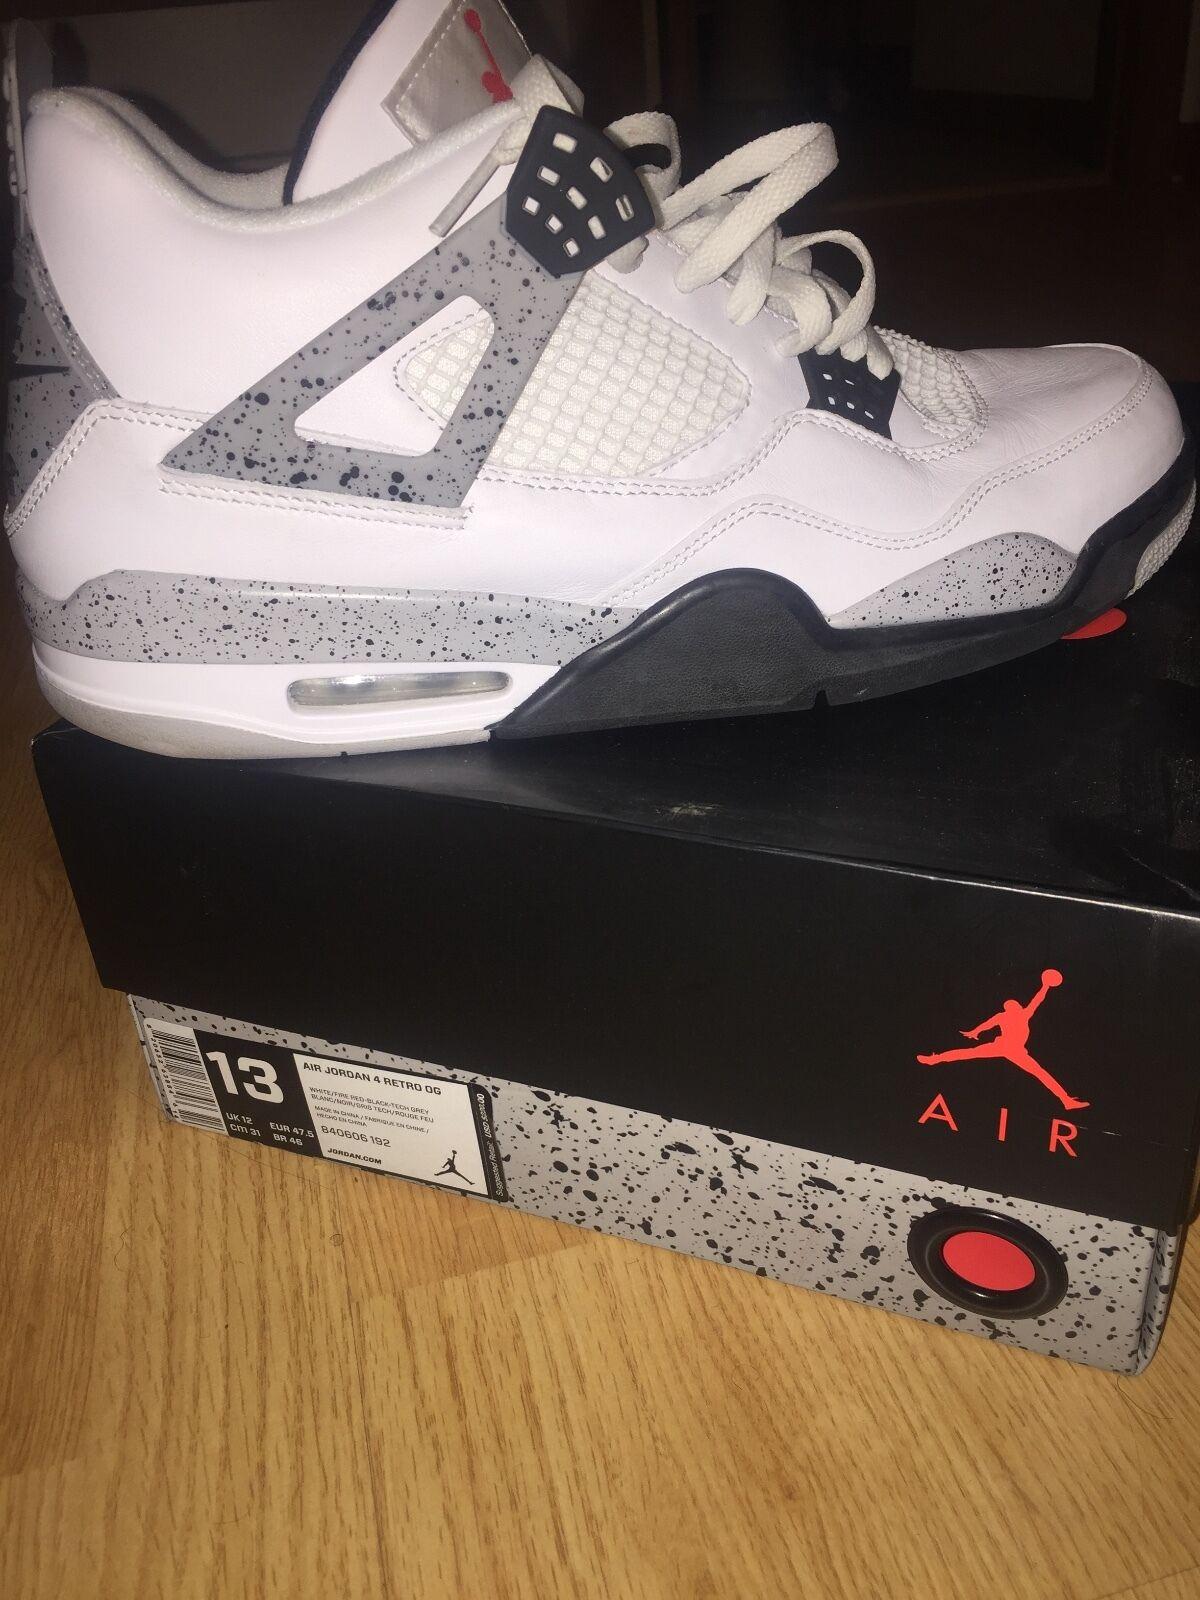 Jordan IV Größe 13 authenic brand new with box